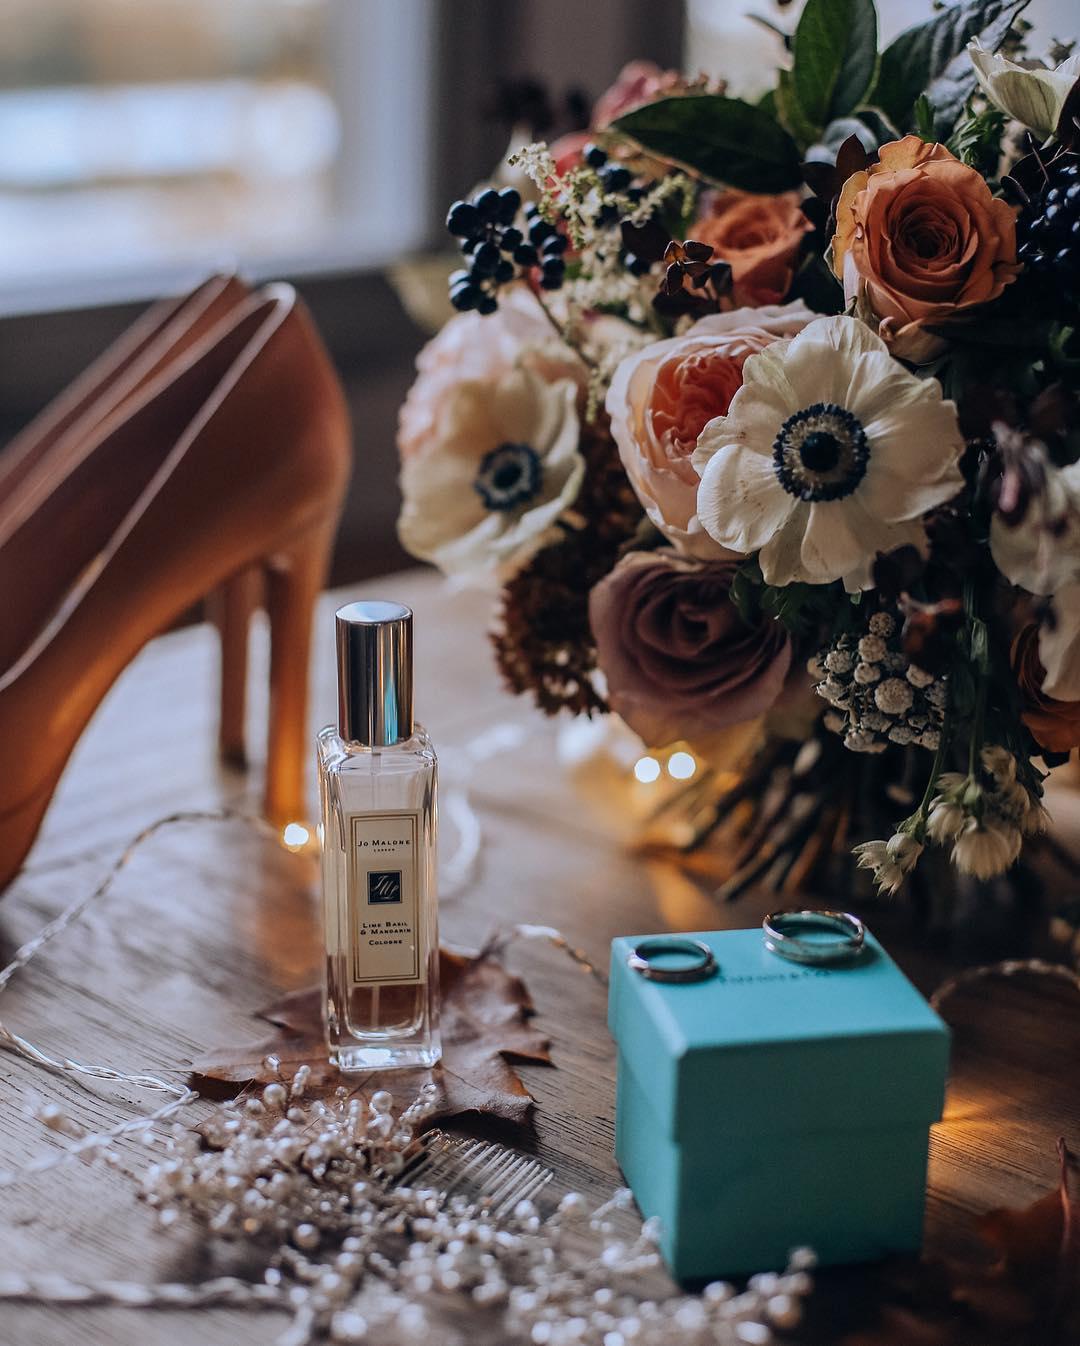 26-wedding-makeup-ideas-for-brides-2019